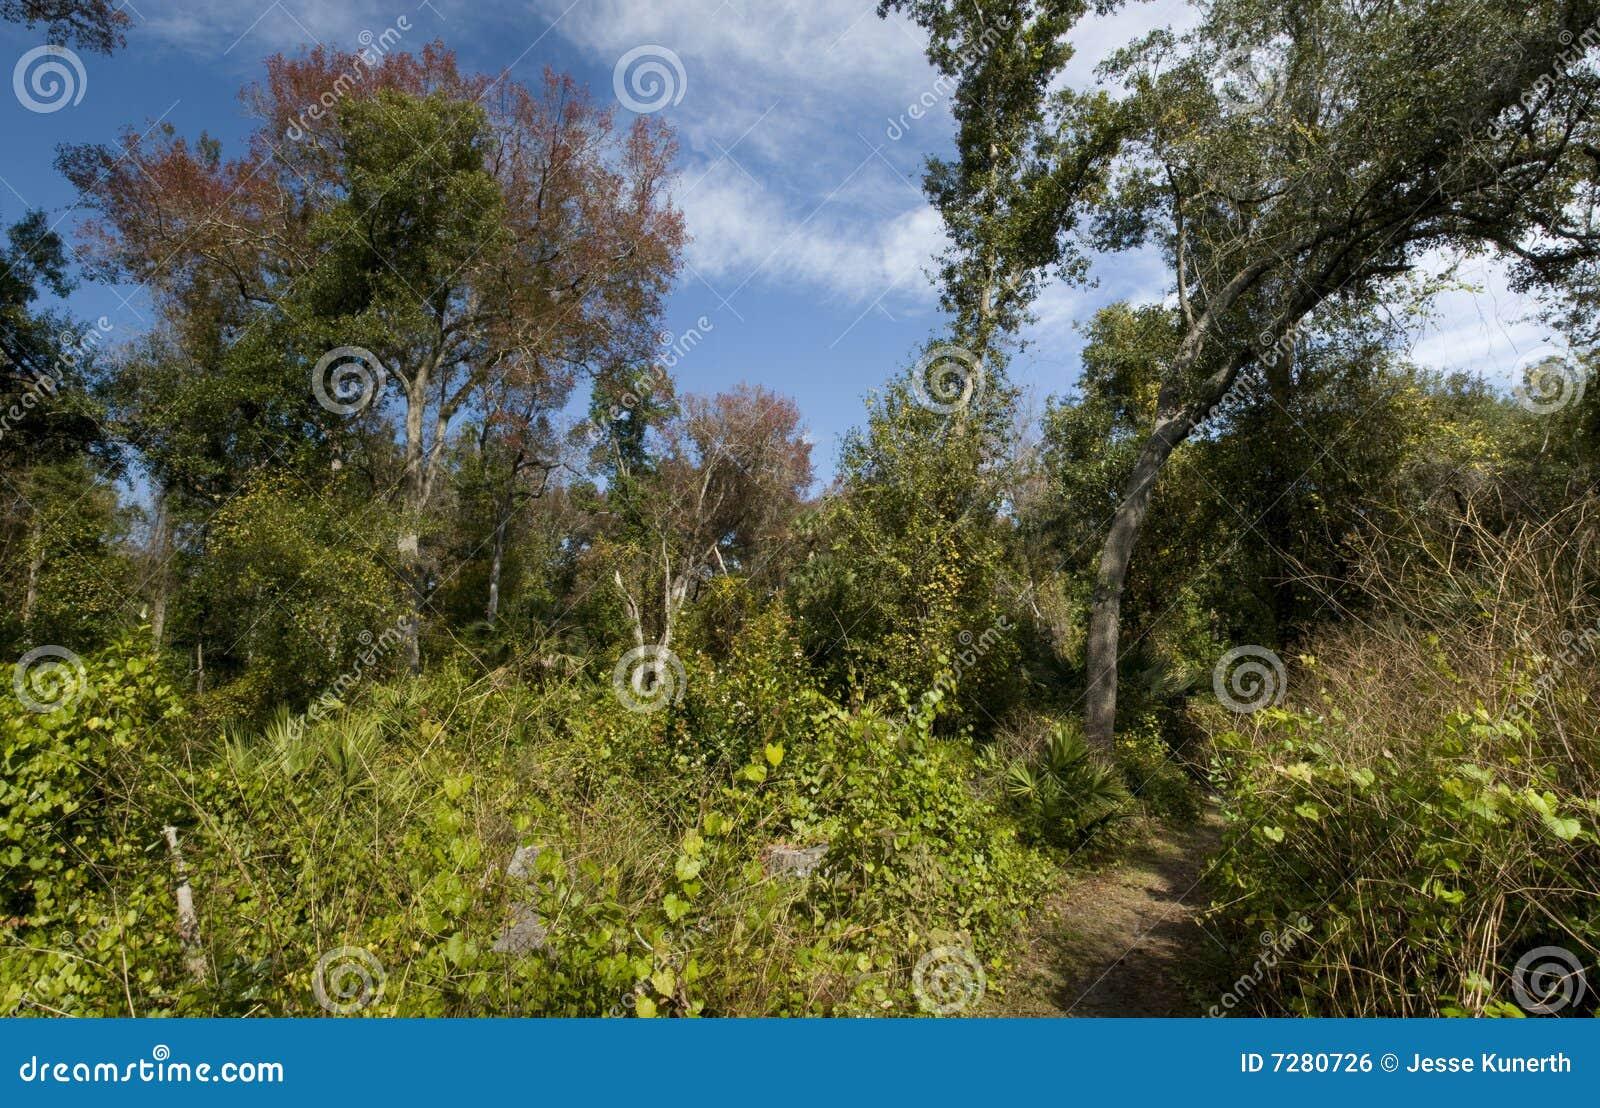 Panorama de la naturaleza